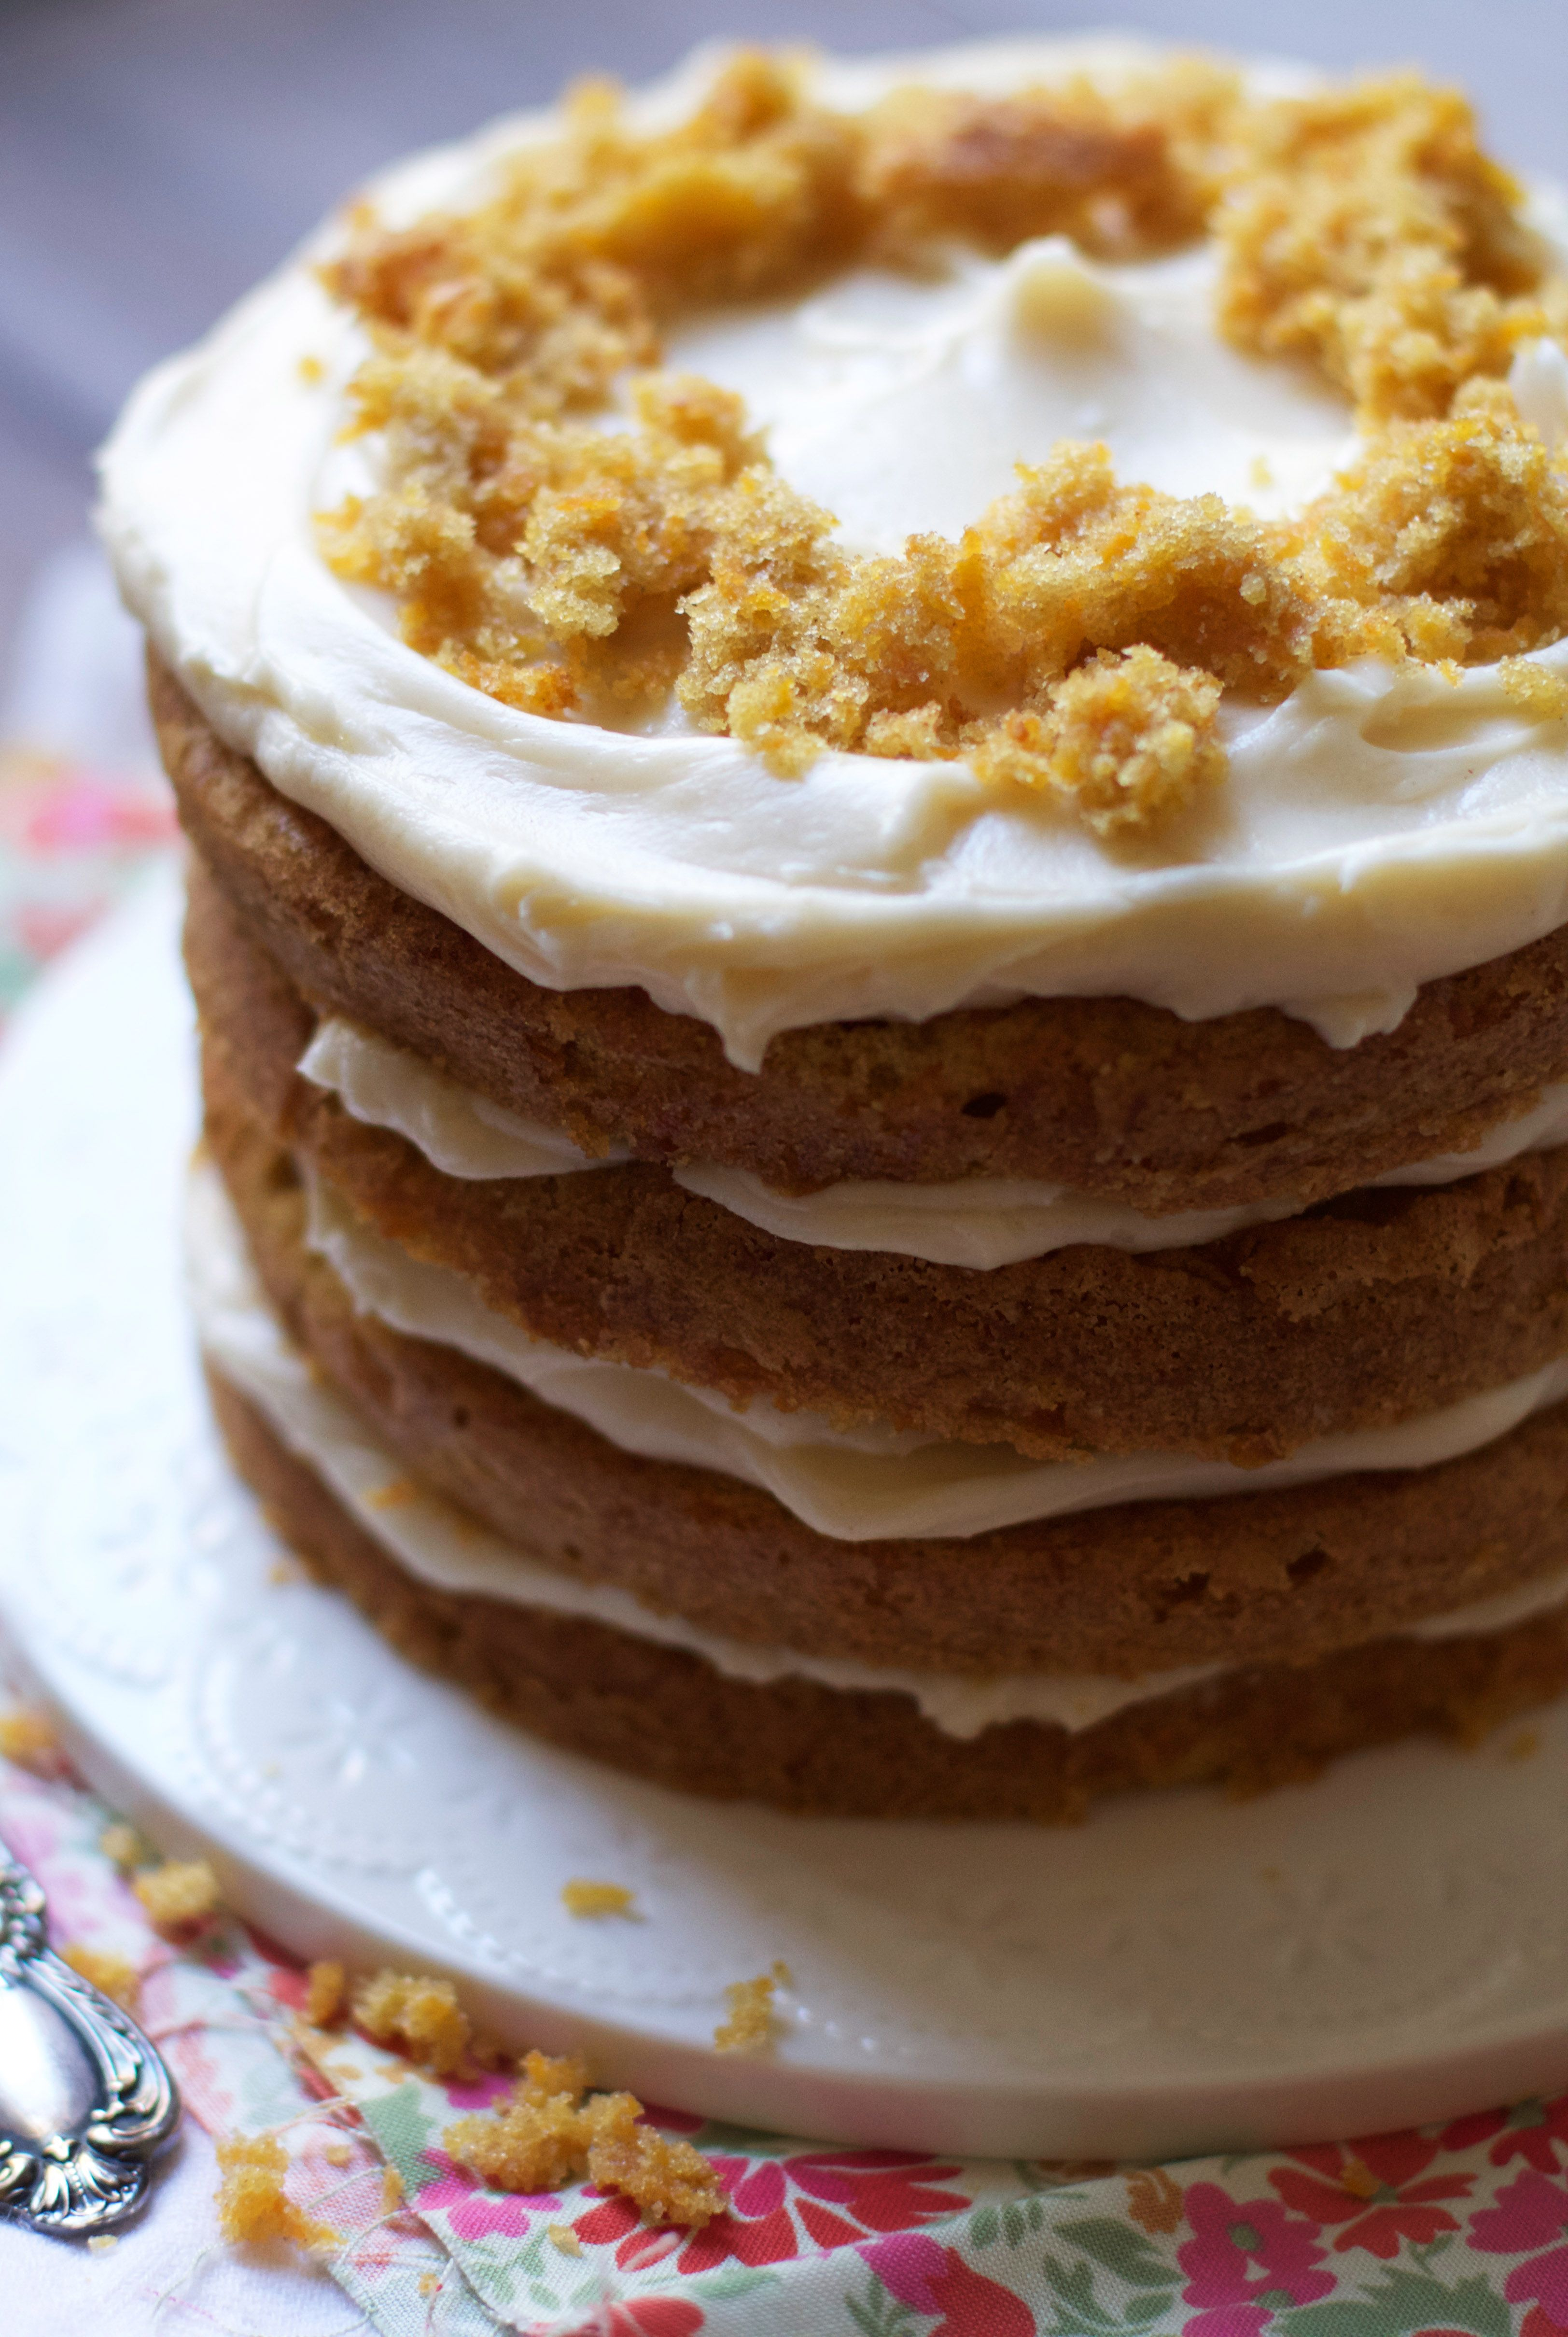 Carrot cake recipe 1 layer